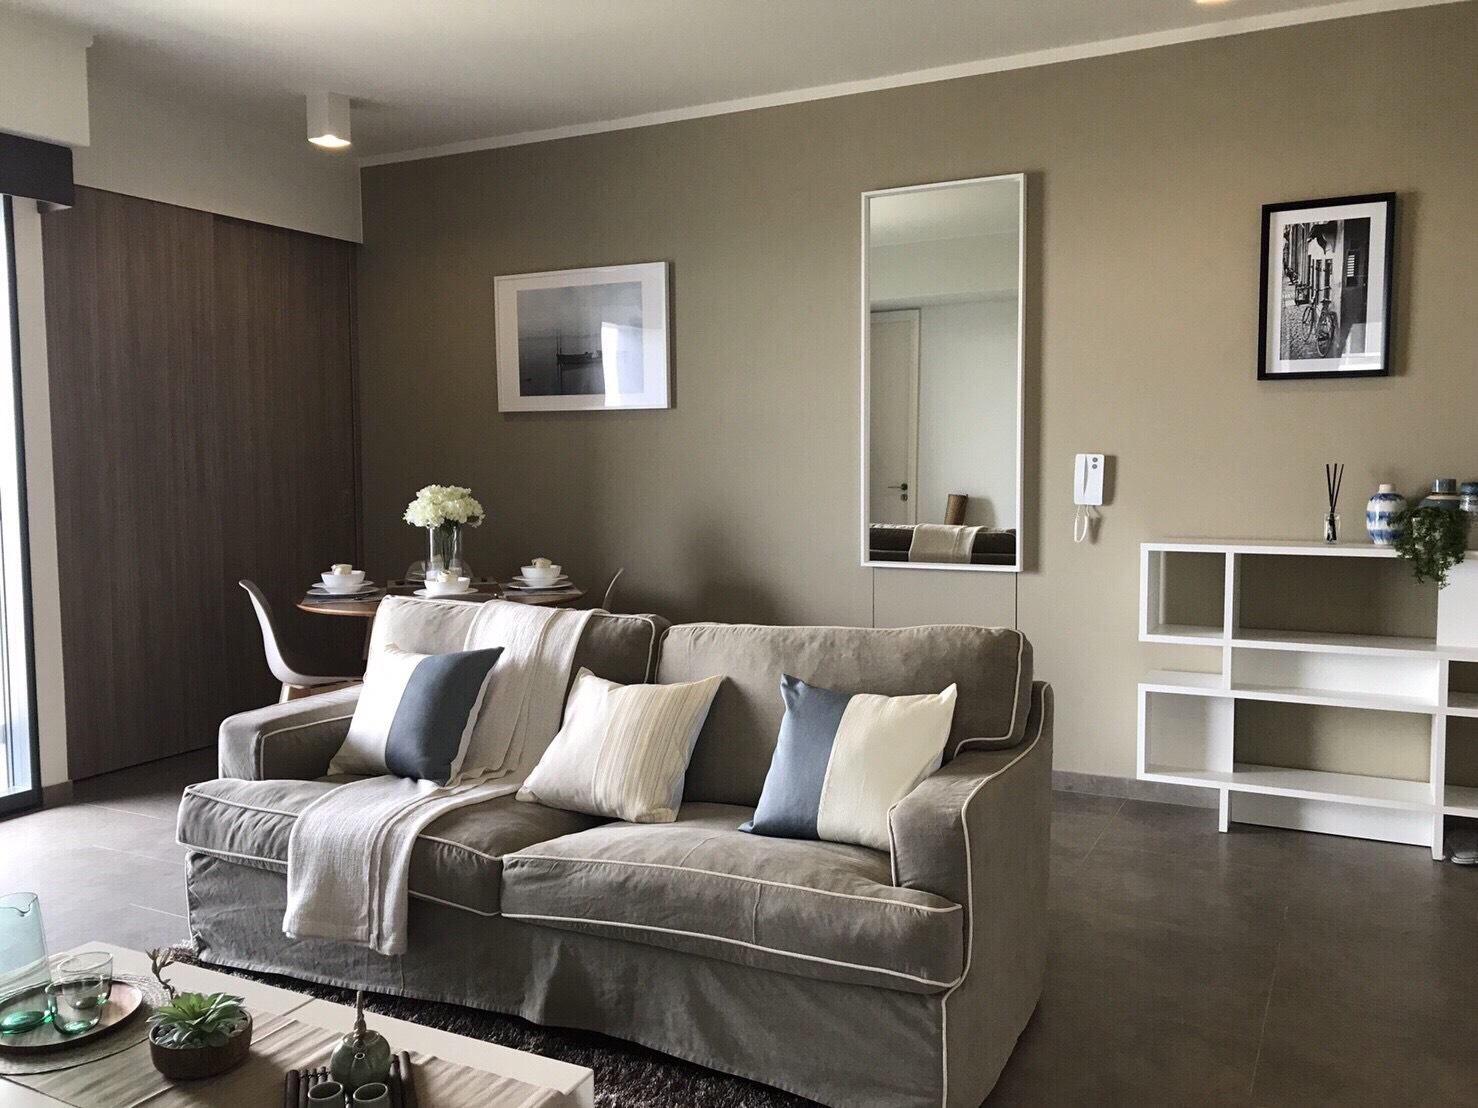 Zire Wongamat (ซายร์ คอนโดมิเนียม) for rent – 2 bedroom